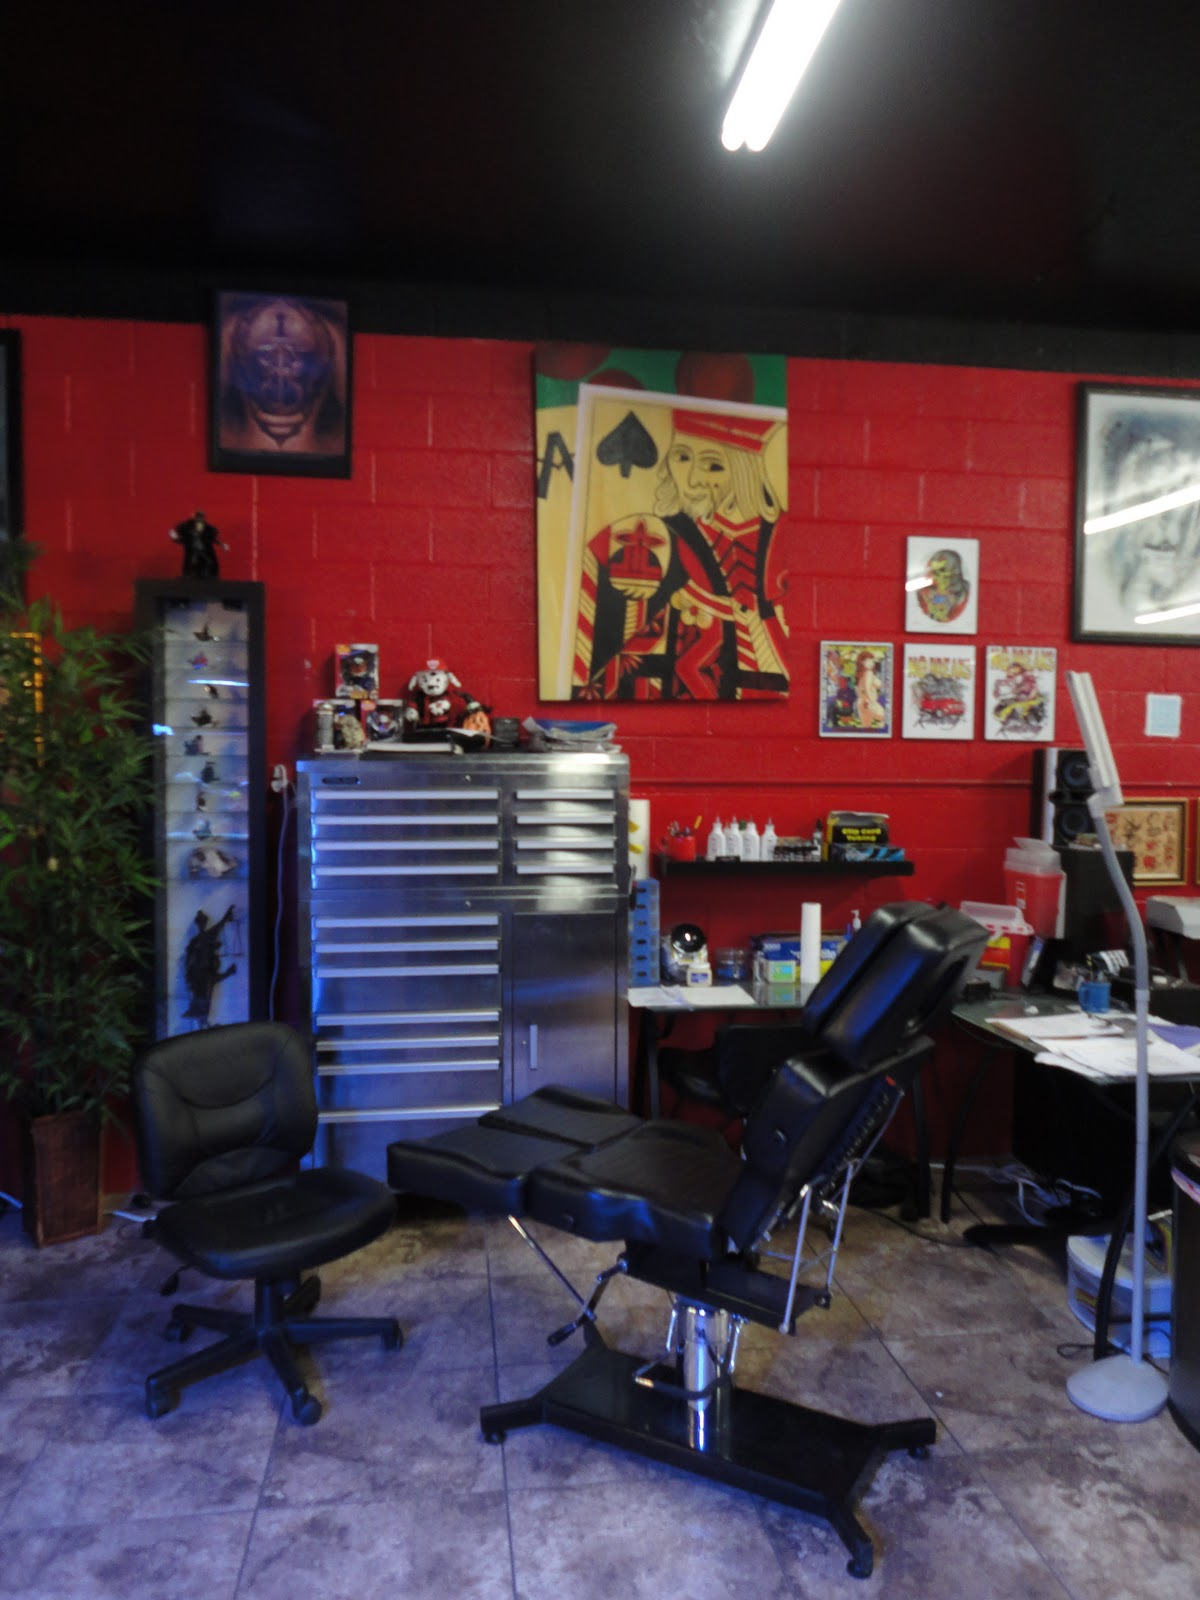 Electric chair tattoo - Electric Chair Tattoo 53